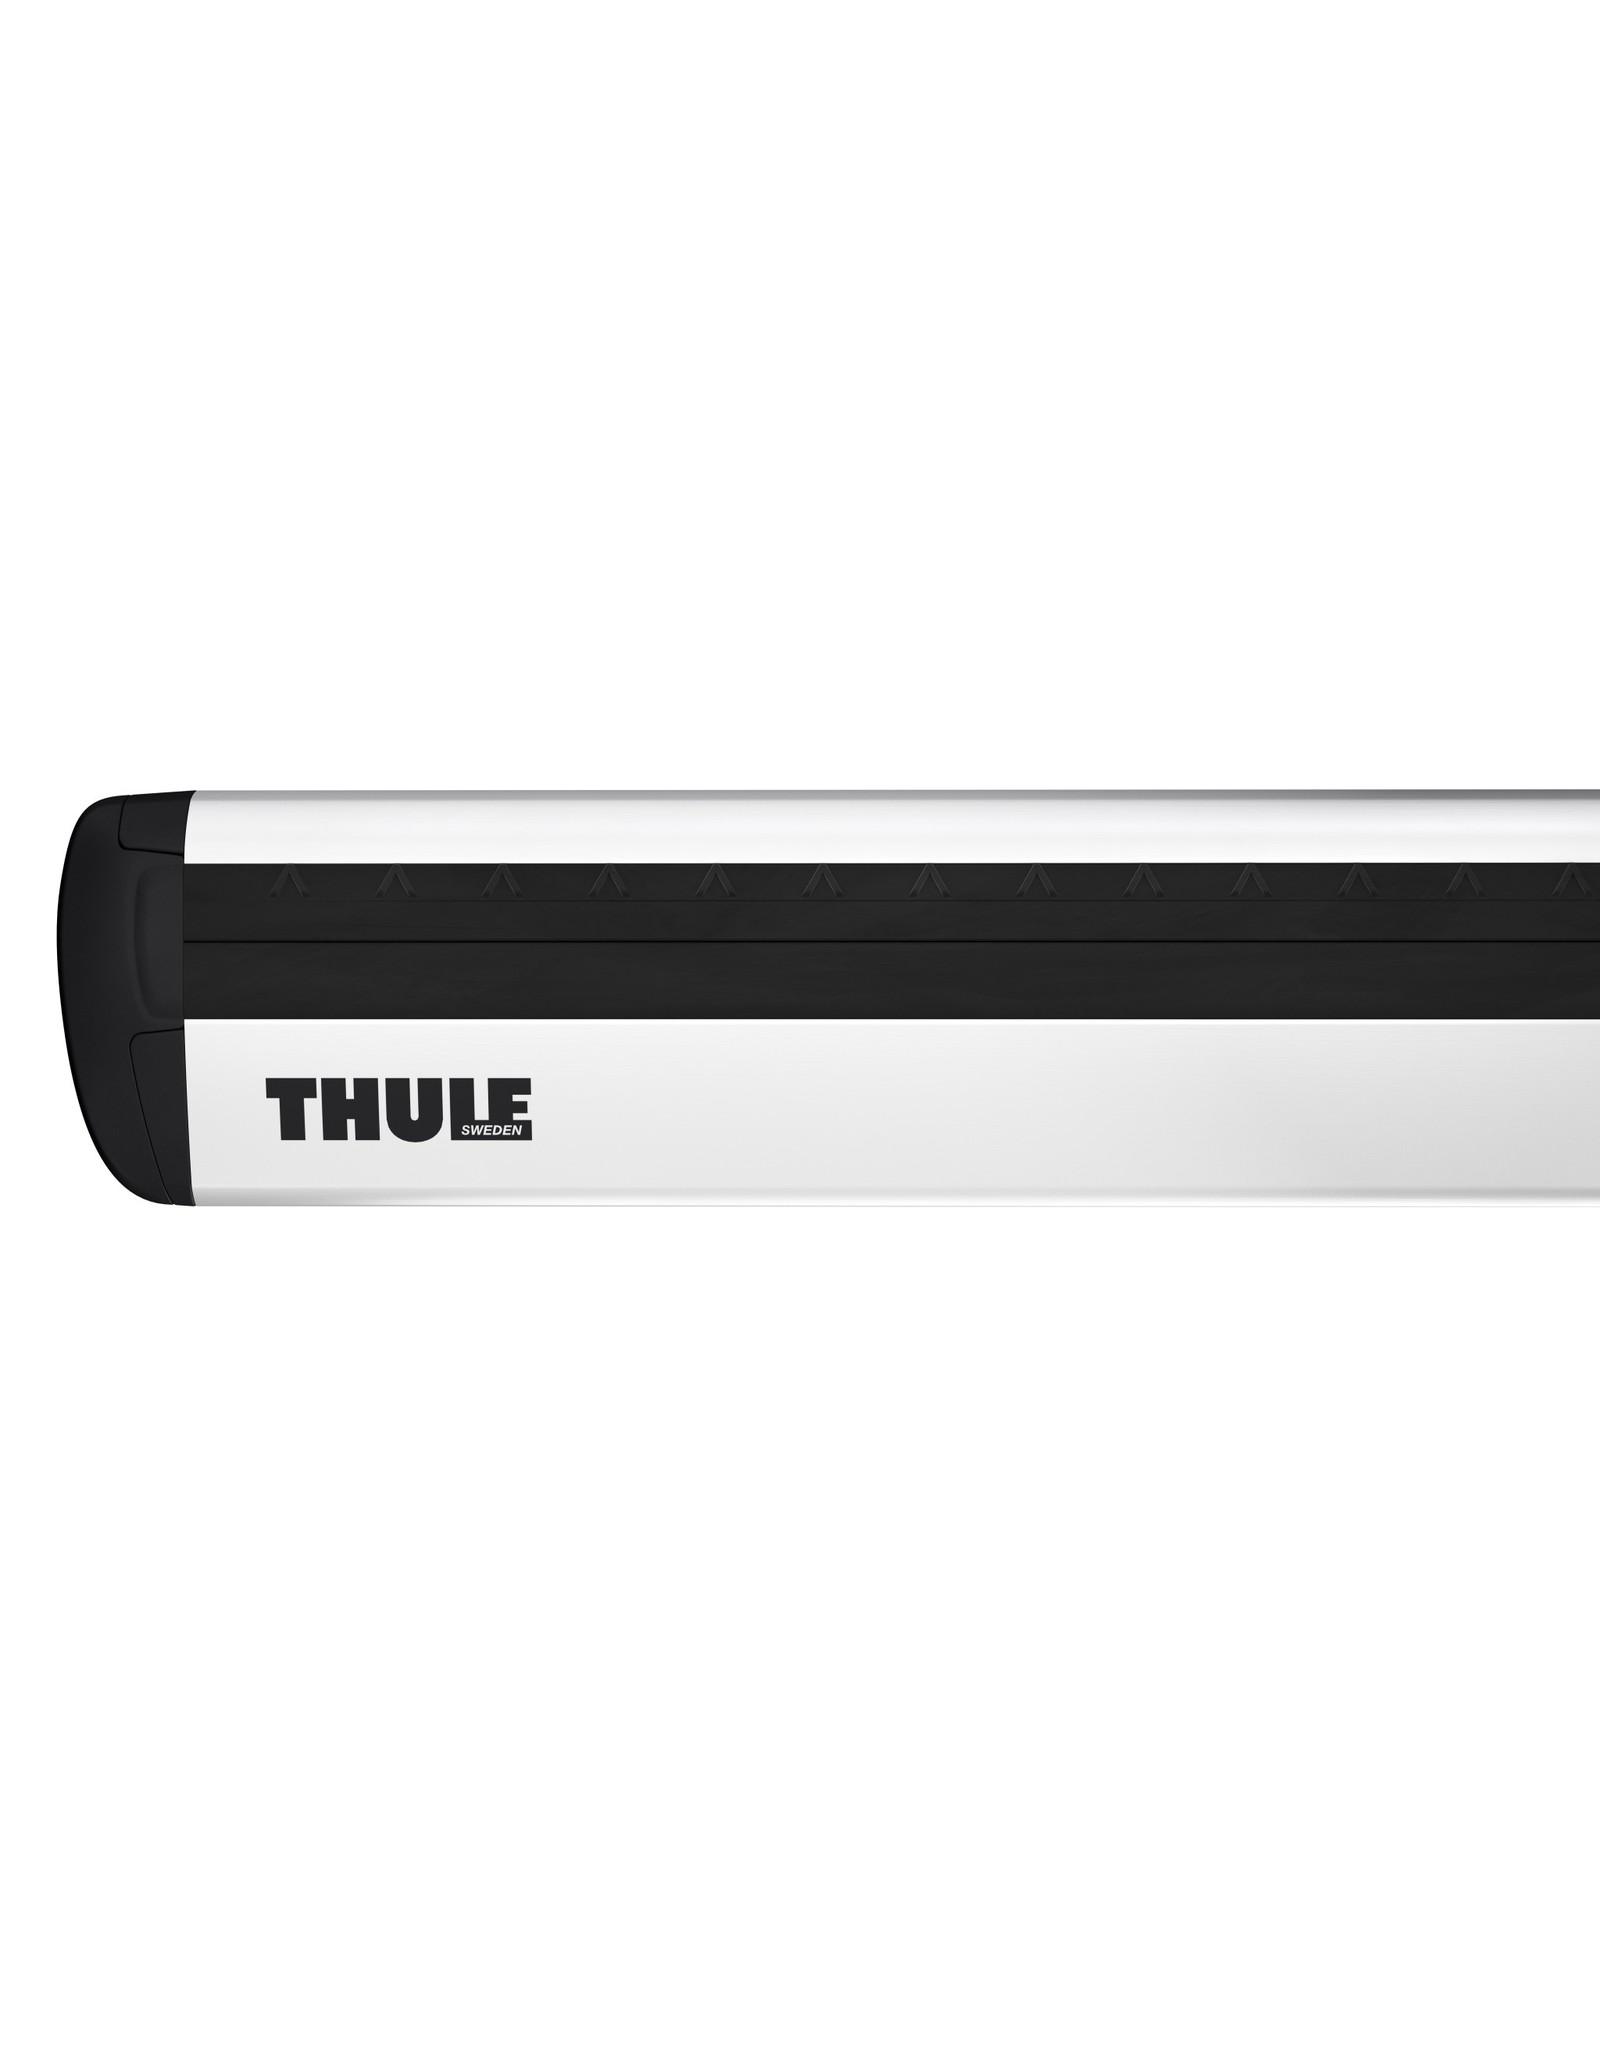 "THULE Wingbar Evo 118 (47"") Silver"